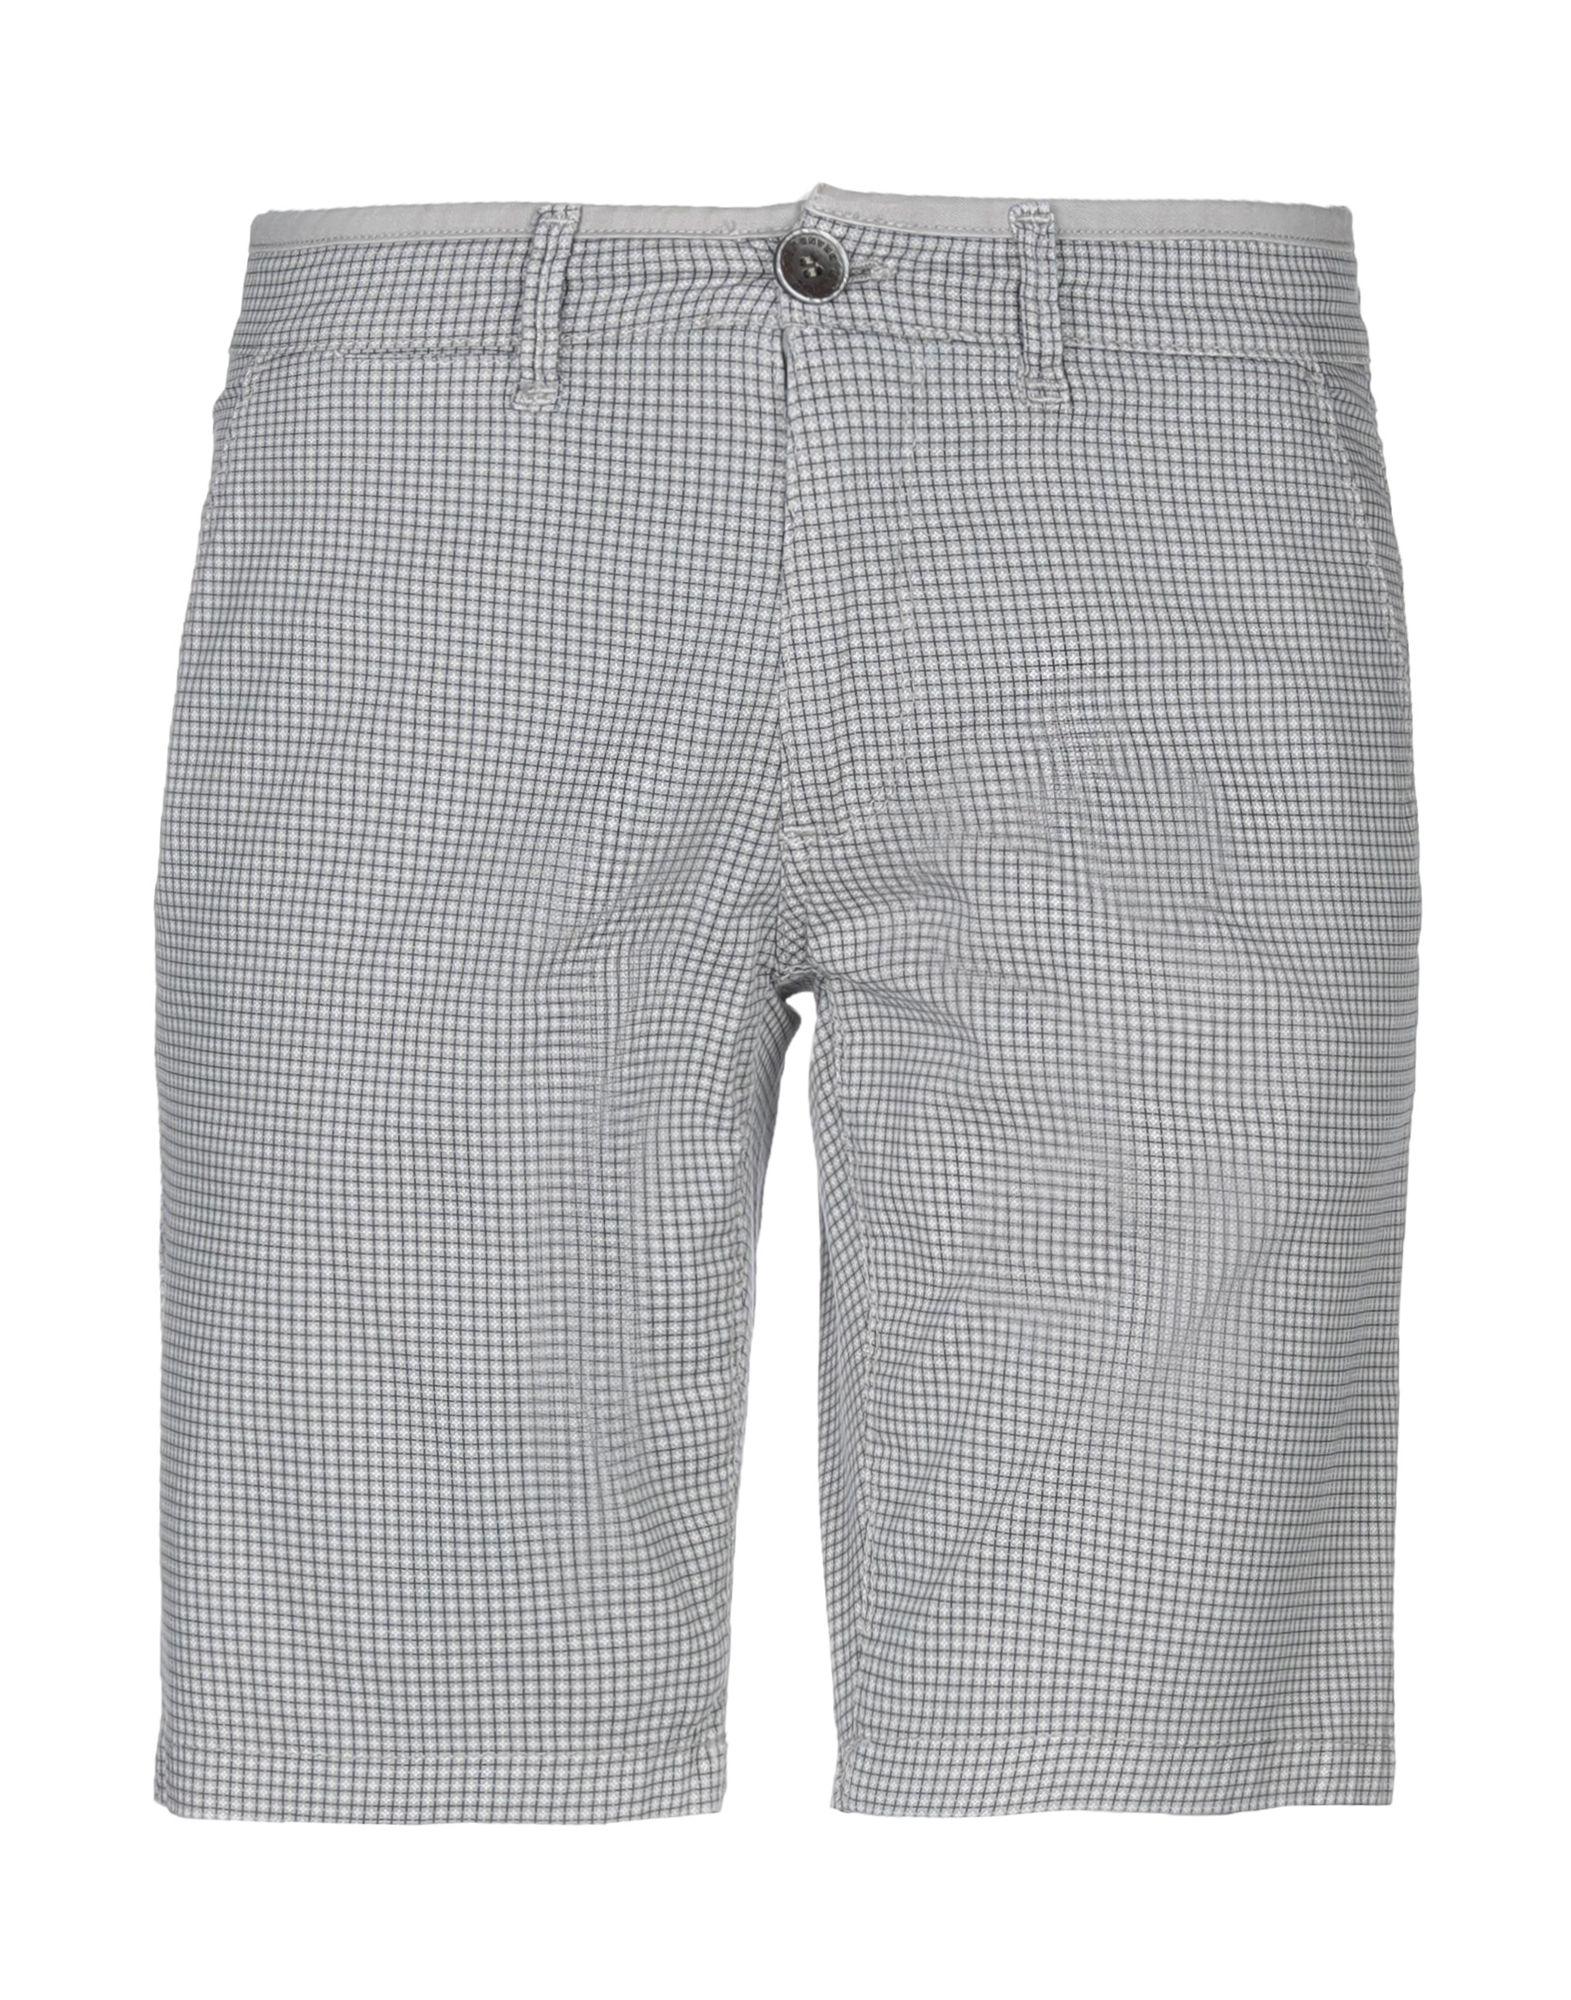 Shorts & Bermuda Enjoy Brand+Jeans herren - 13228226OW